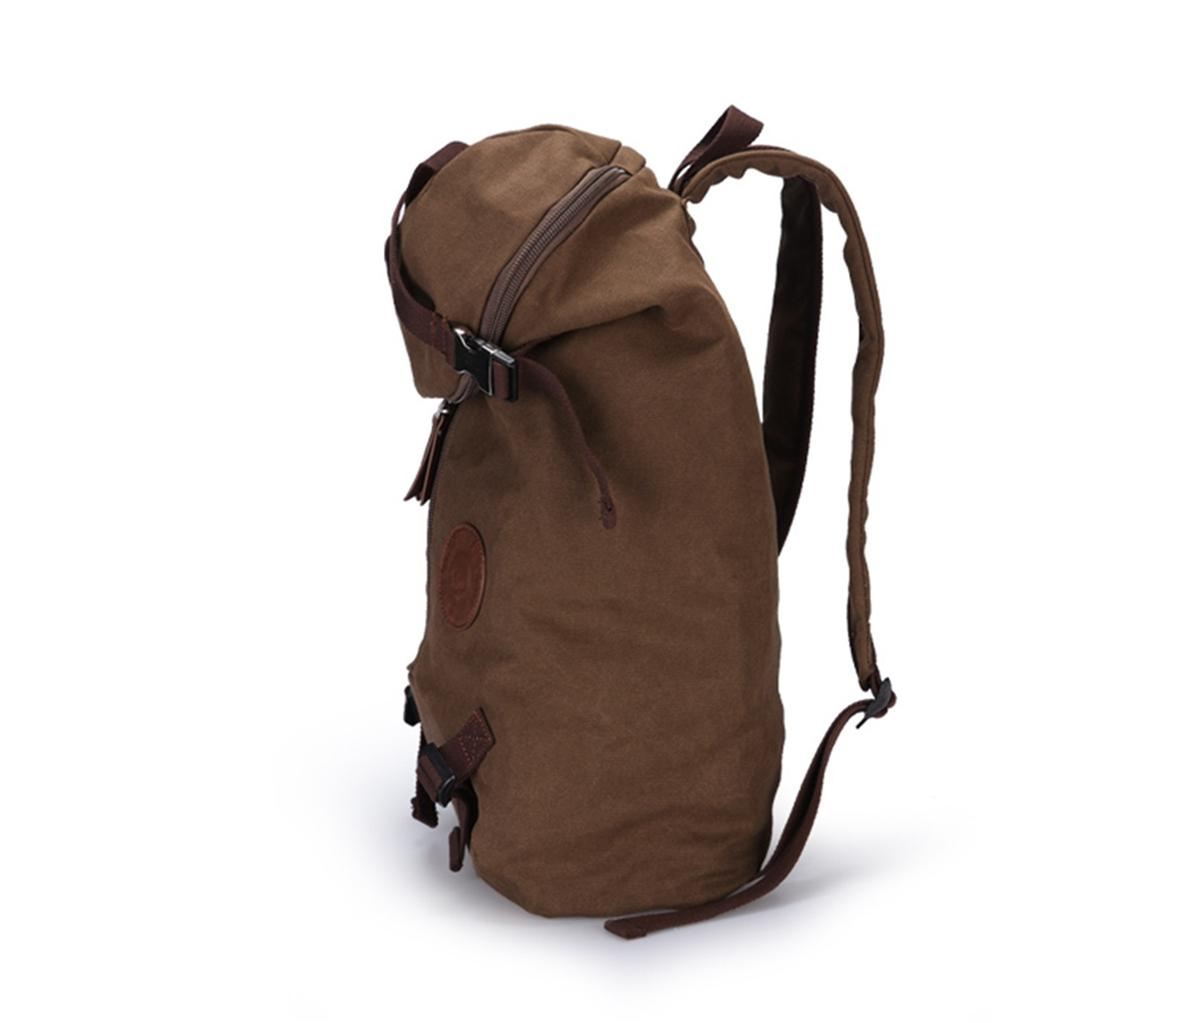 ... Muzee Canvas Backpack Laptop Bag Coffee Big Volume School Bag -0288